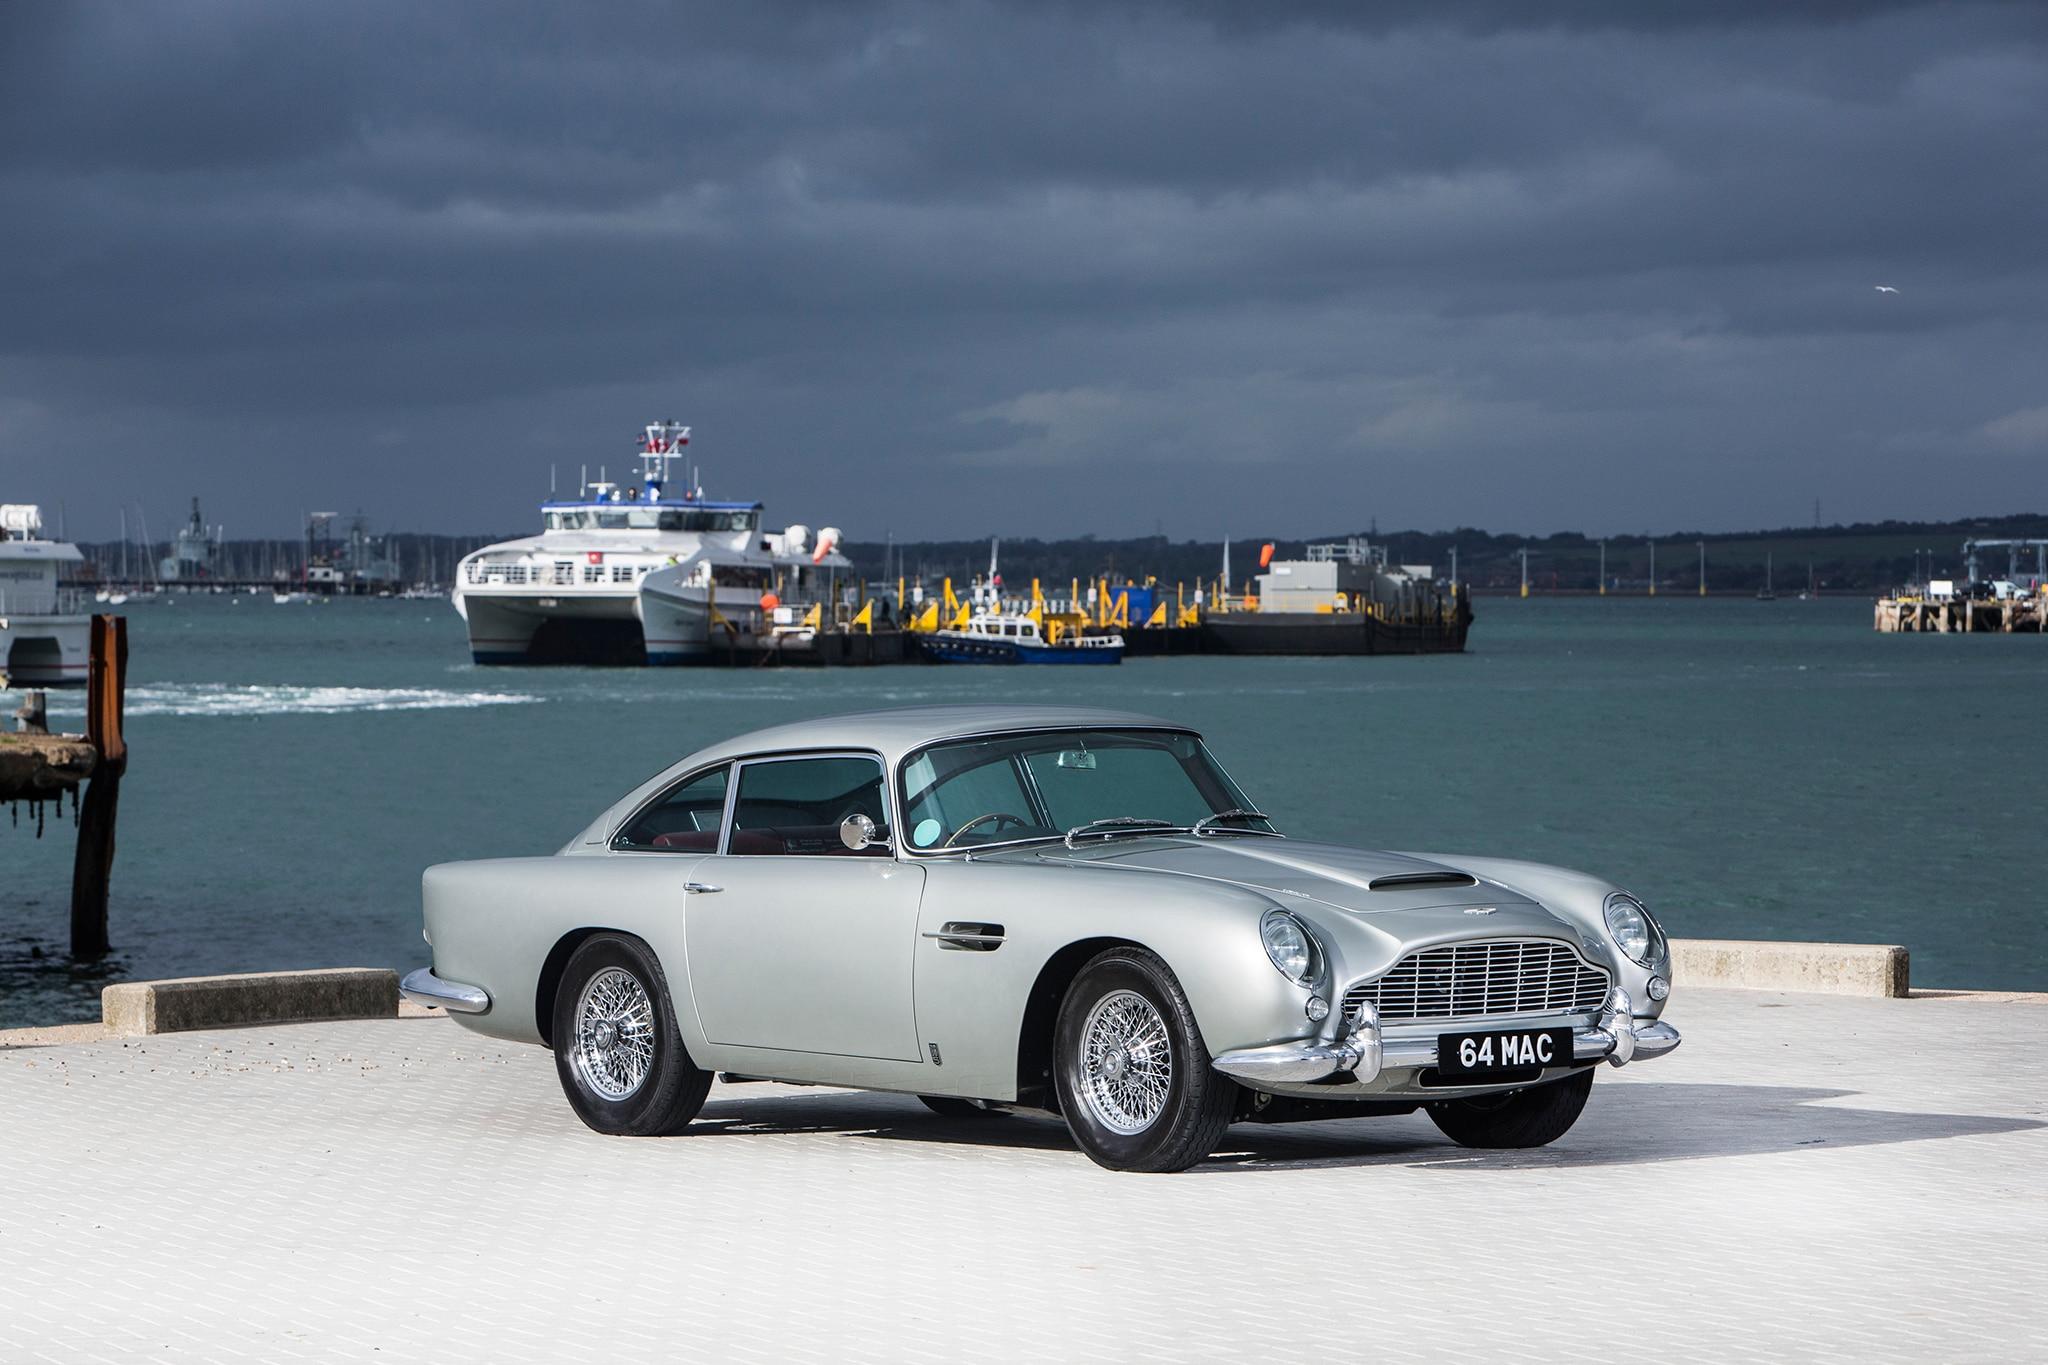 Bonhams to Auction Ex-Paul McCartney Aston Martin DB5 and Ex-Ringo